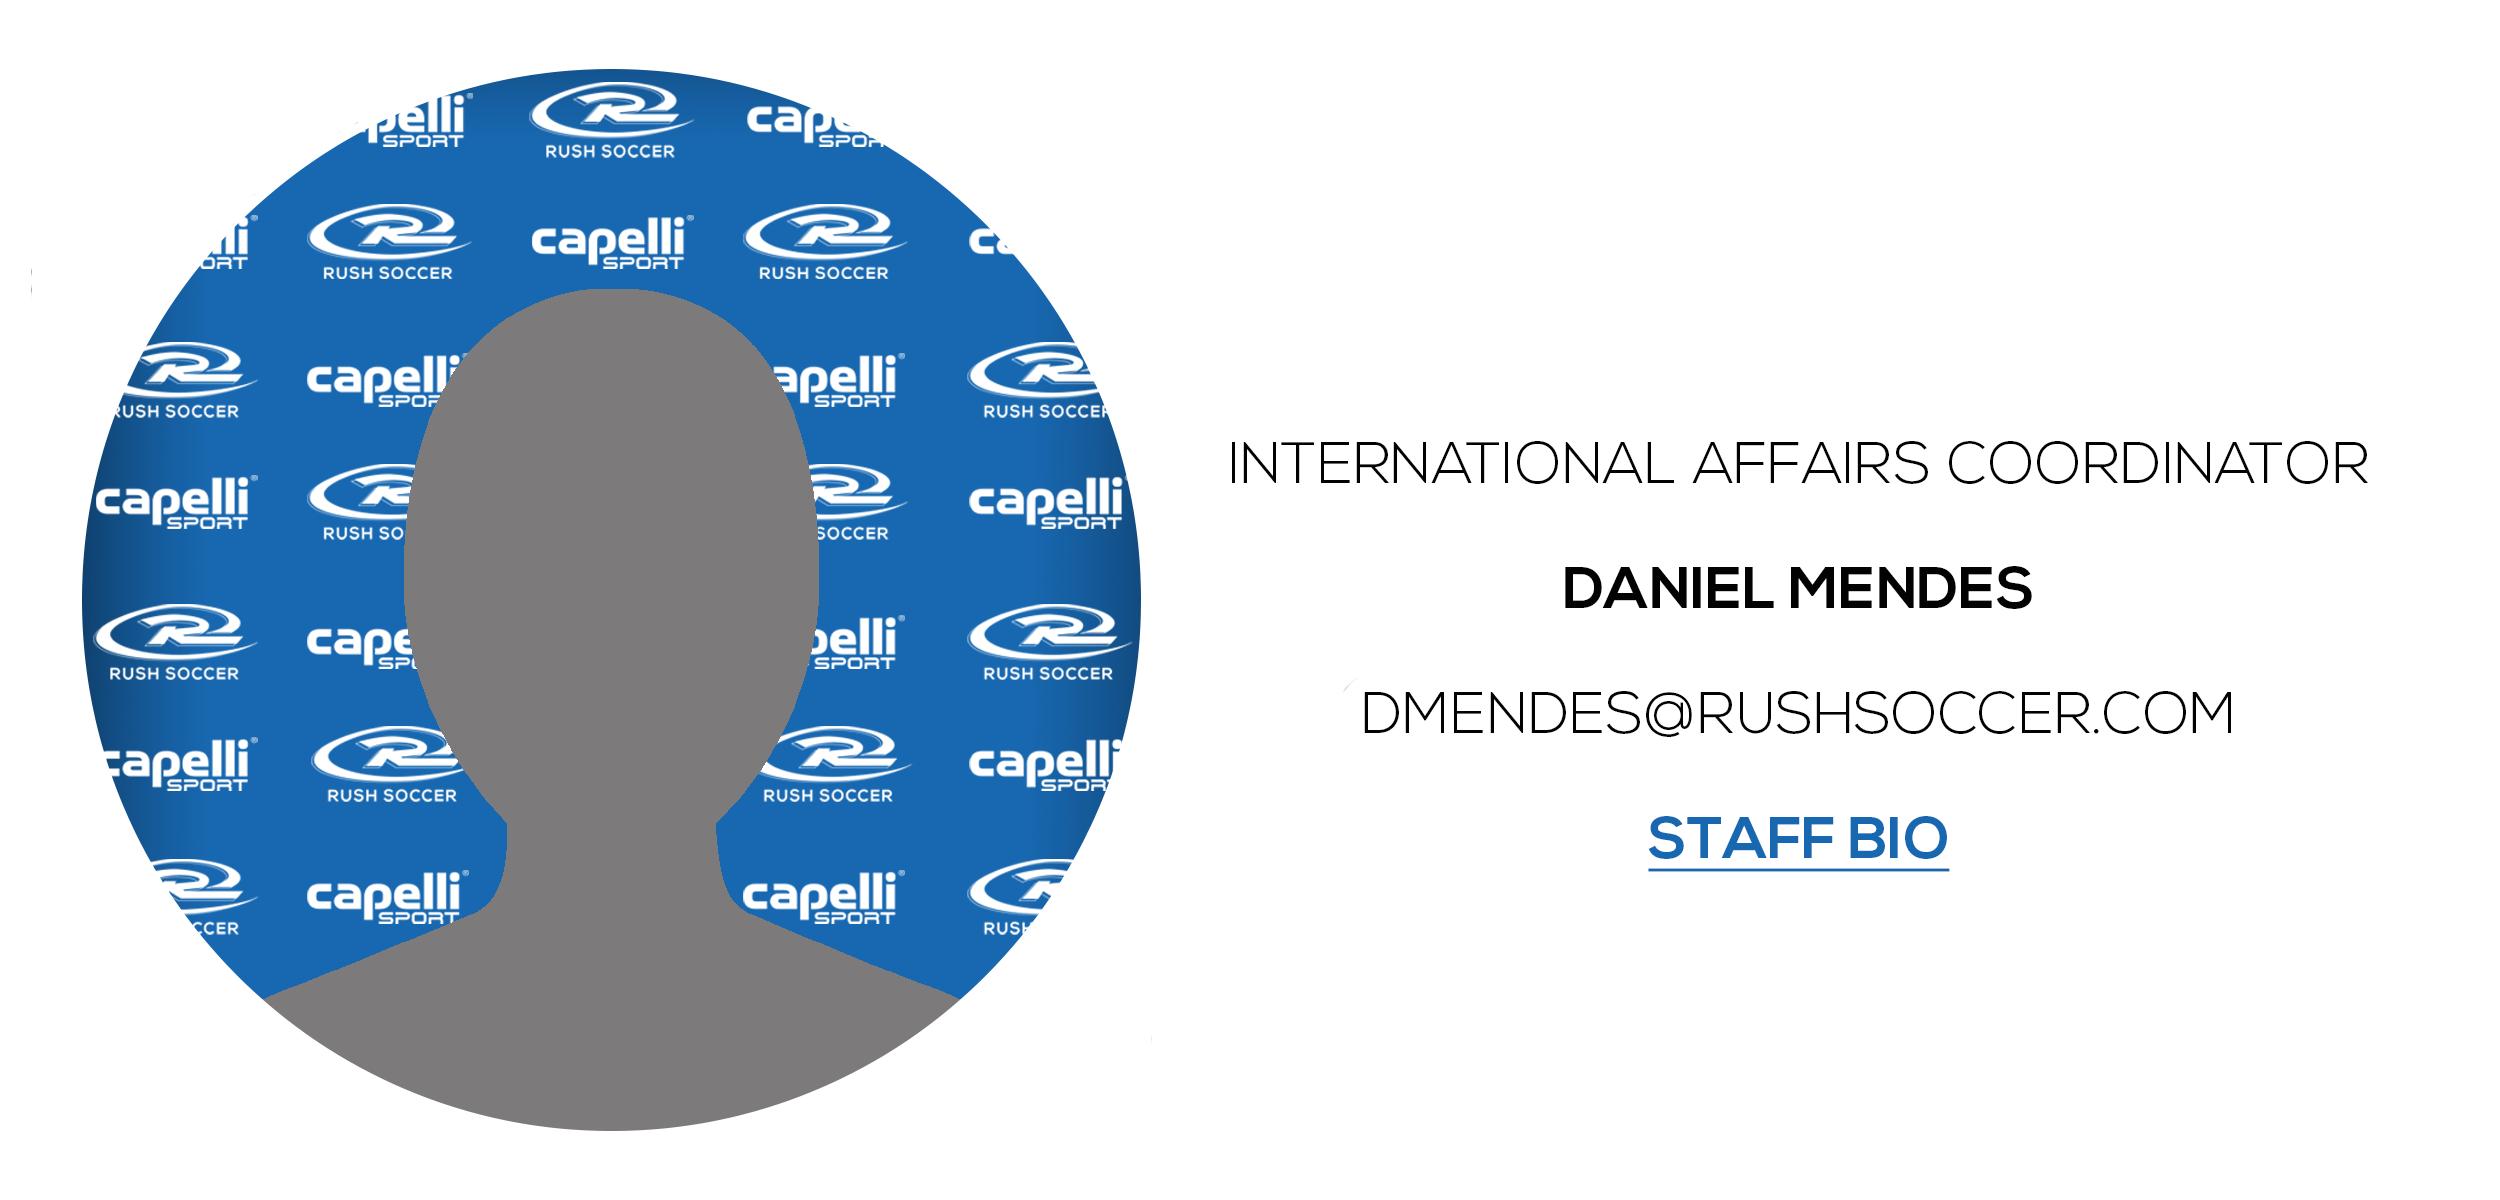 Mendes-Daniel